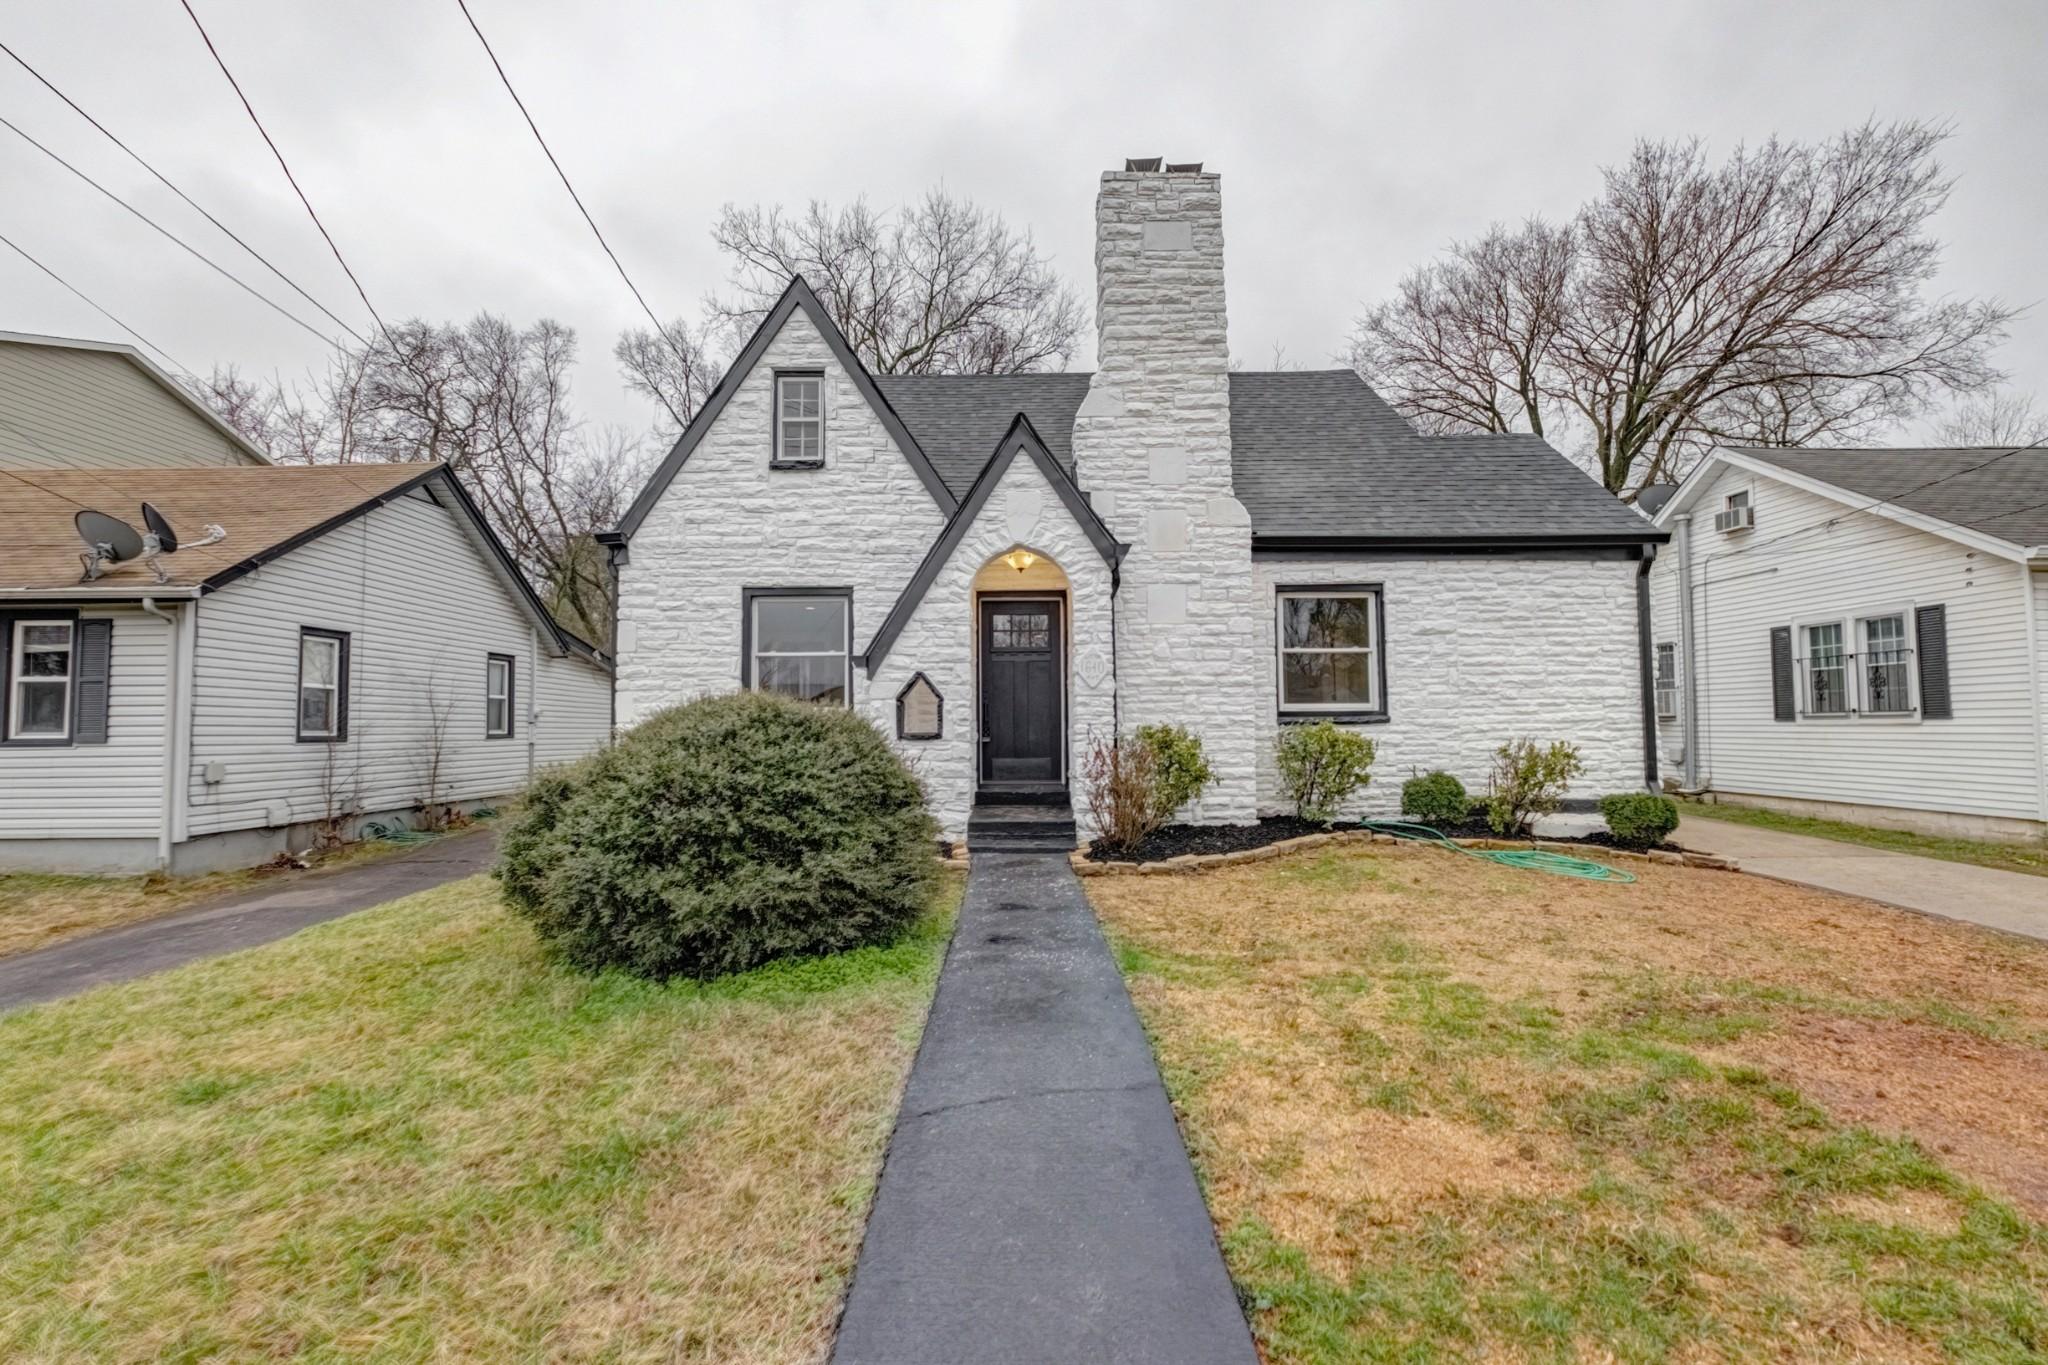 1610 Litton Ave, Nashville, TN 37216 - Nashville, TN real estate listing